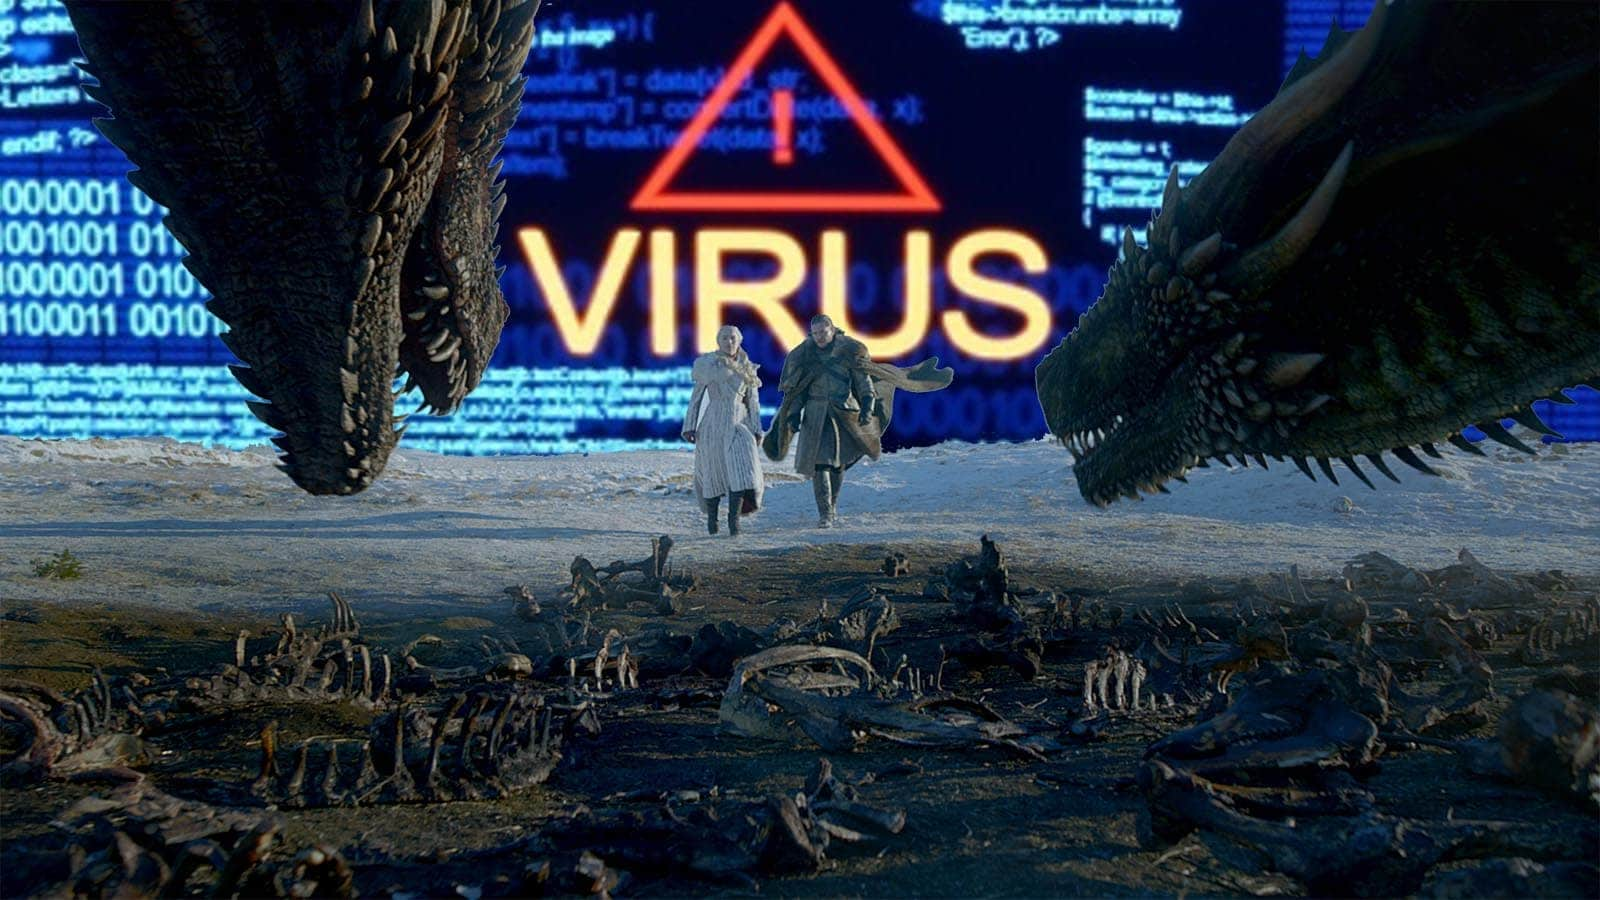 Malware in torrents run rampant on popular shows like Game